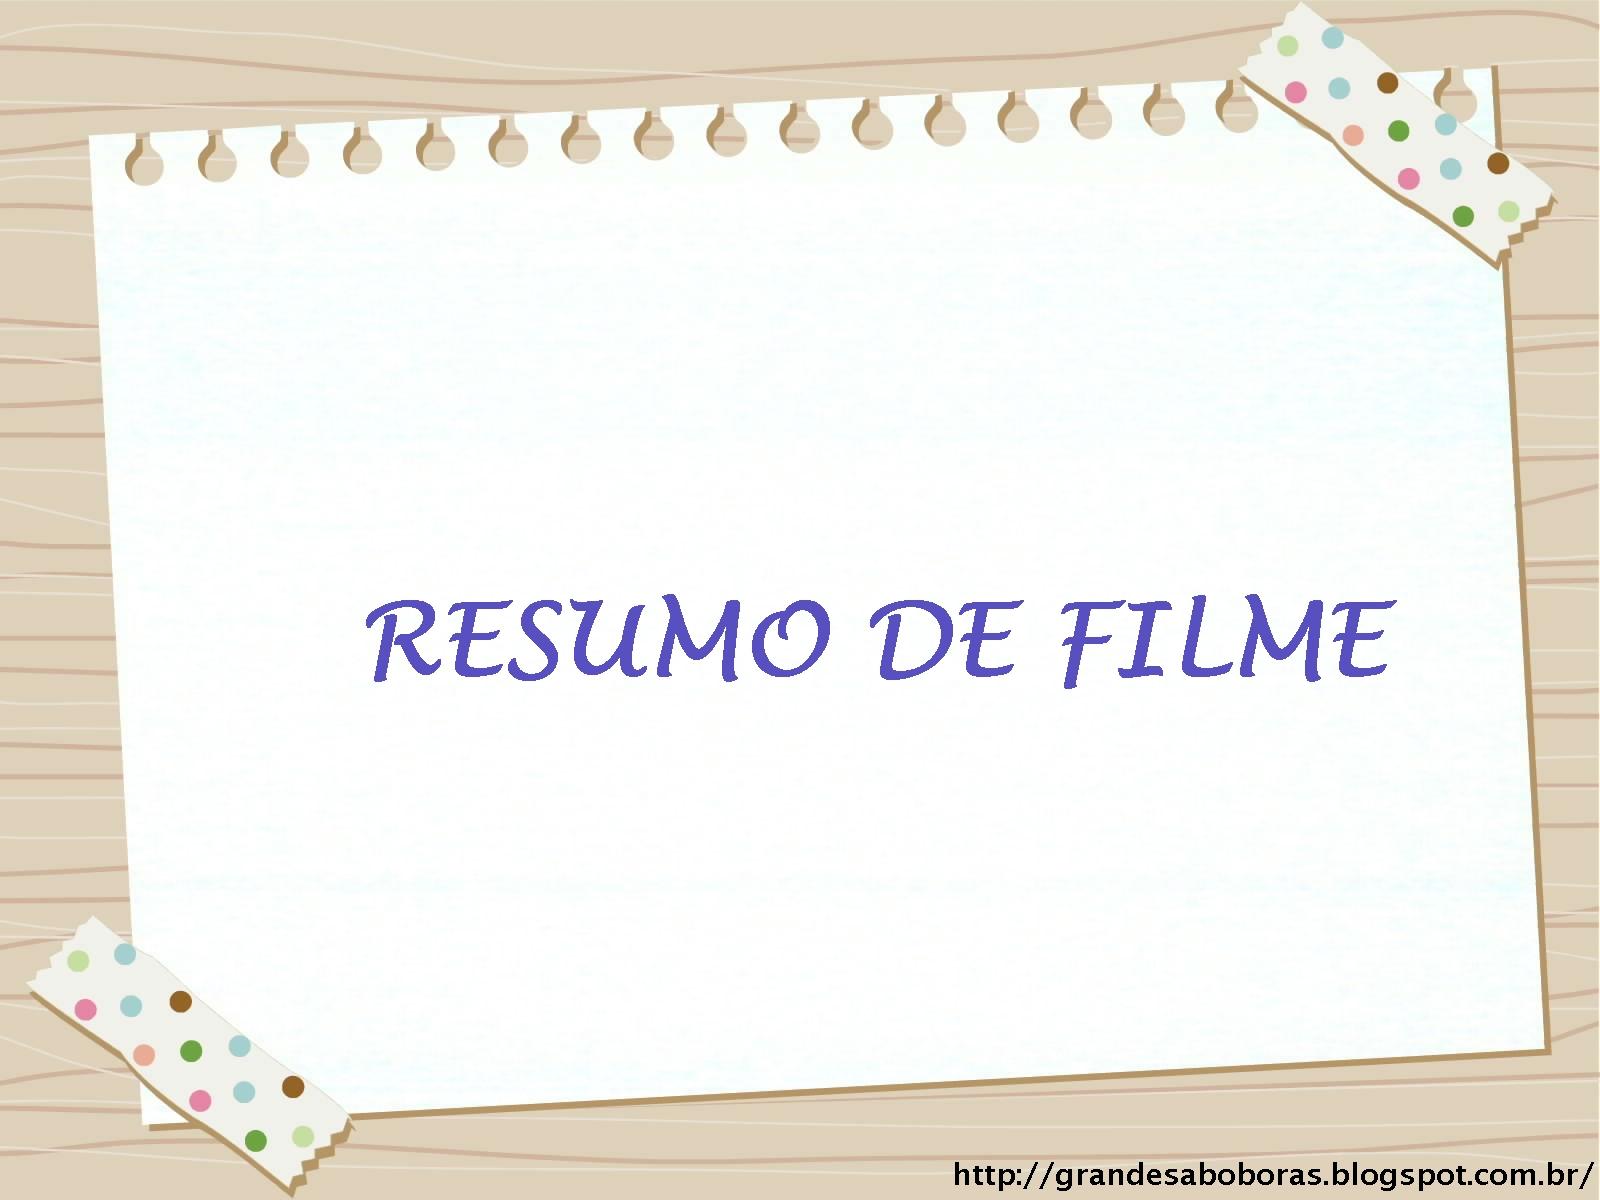 Filme Seu Nome É Jonas in resumo lingua brasileira sinais libras images